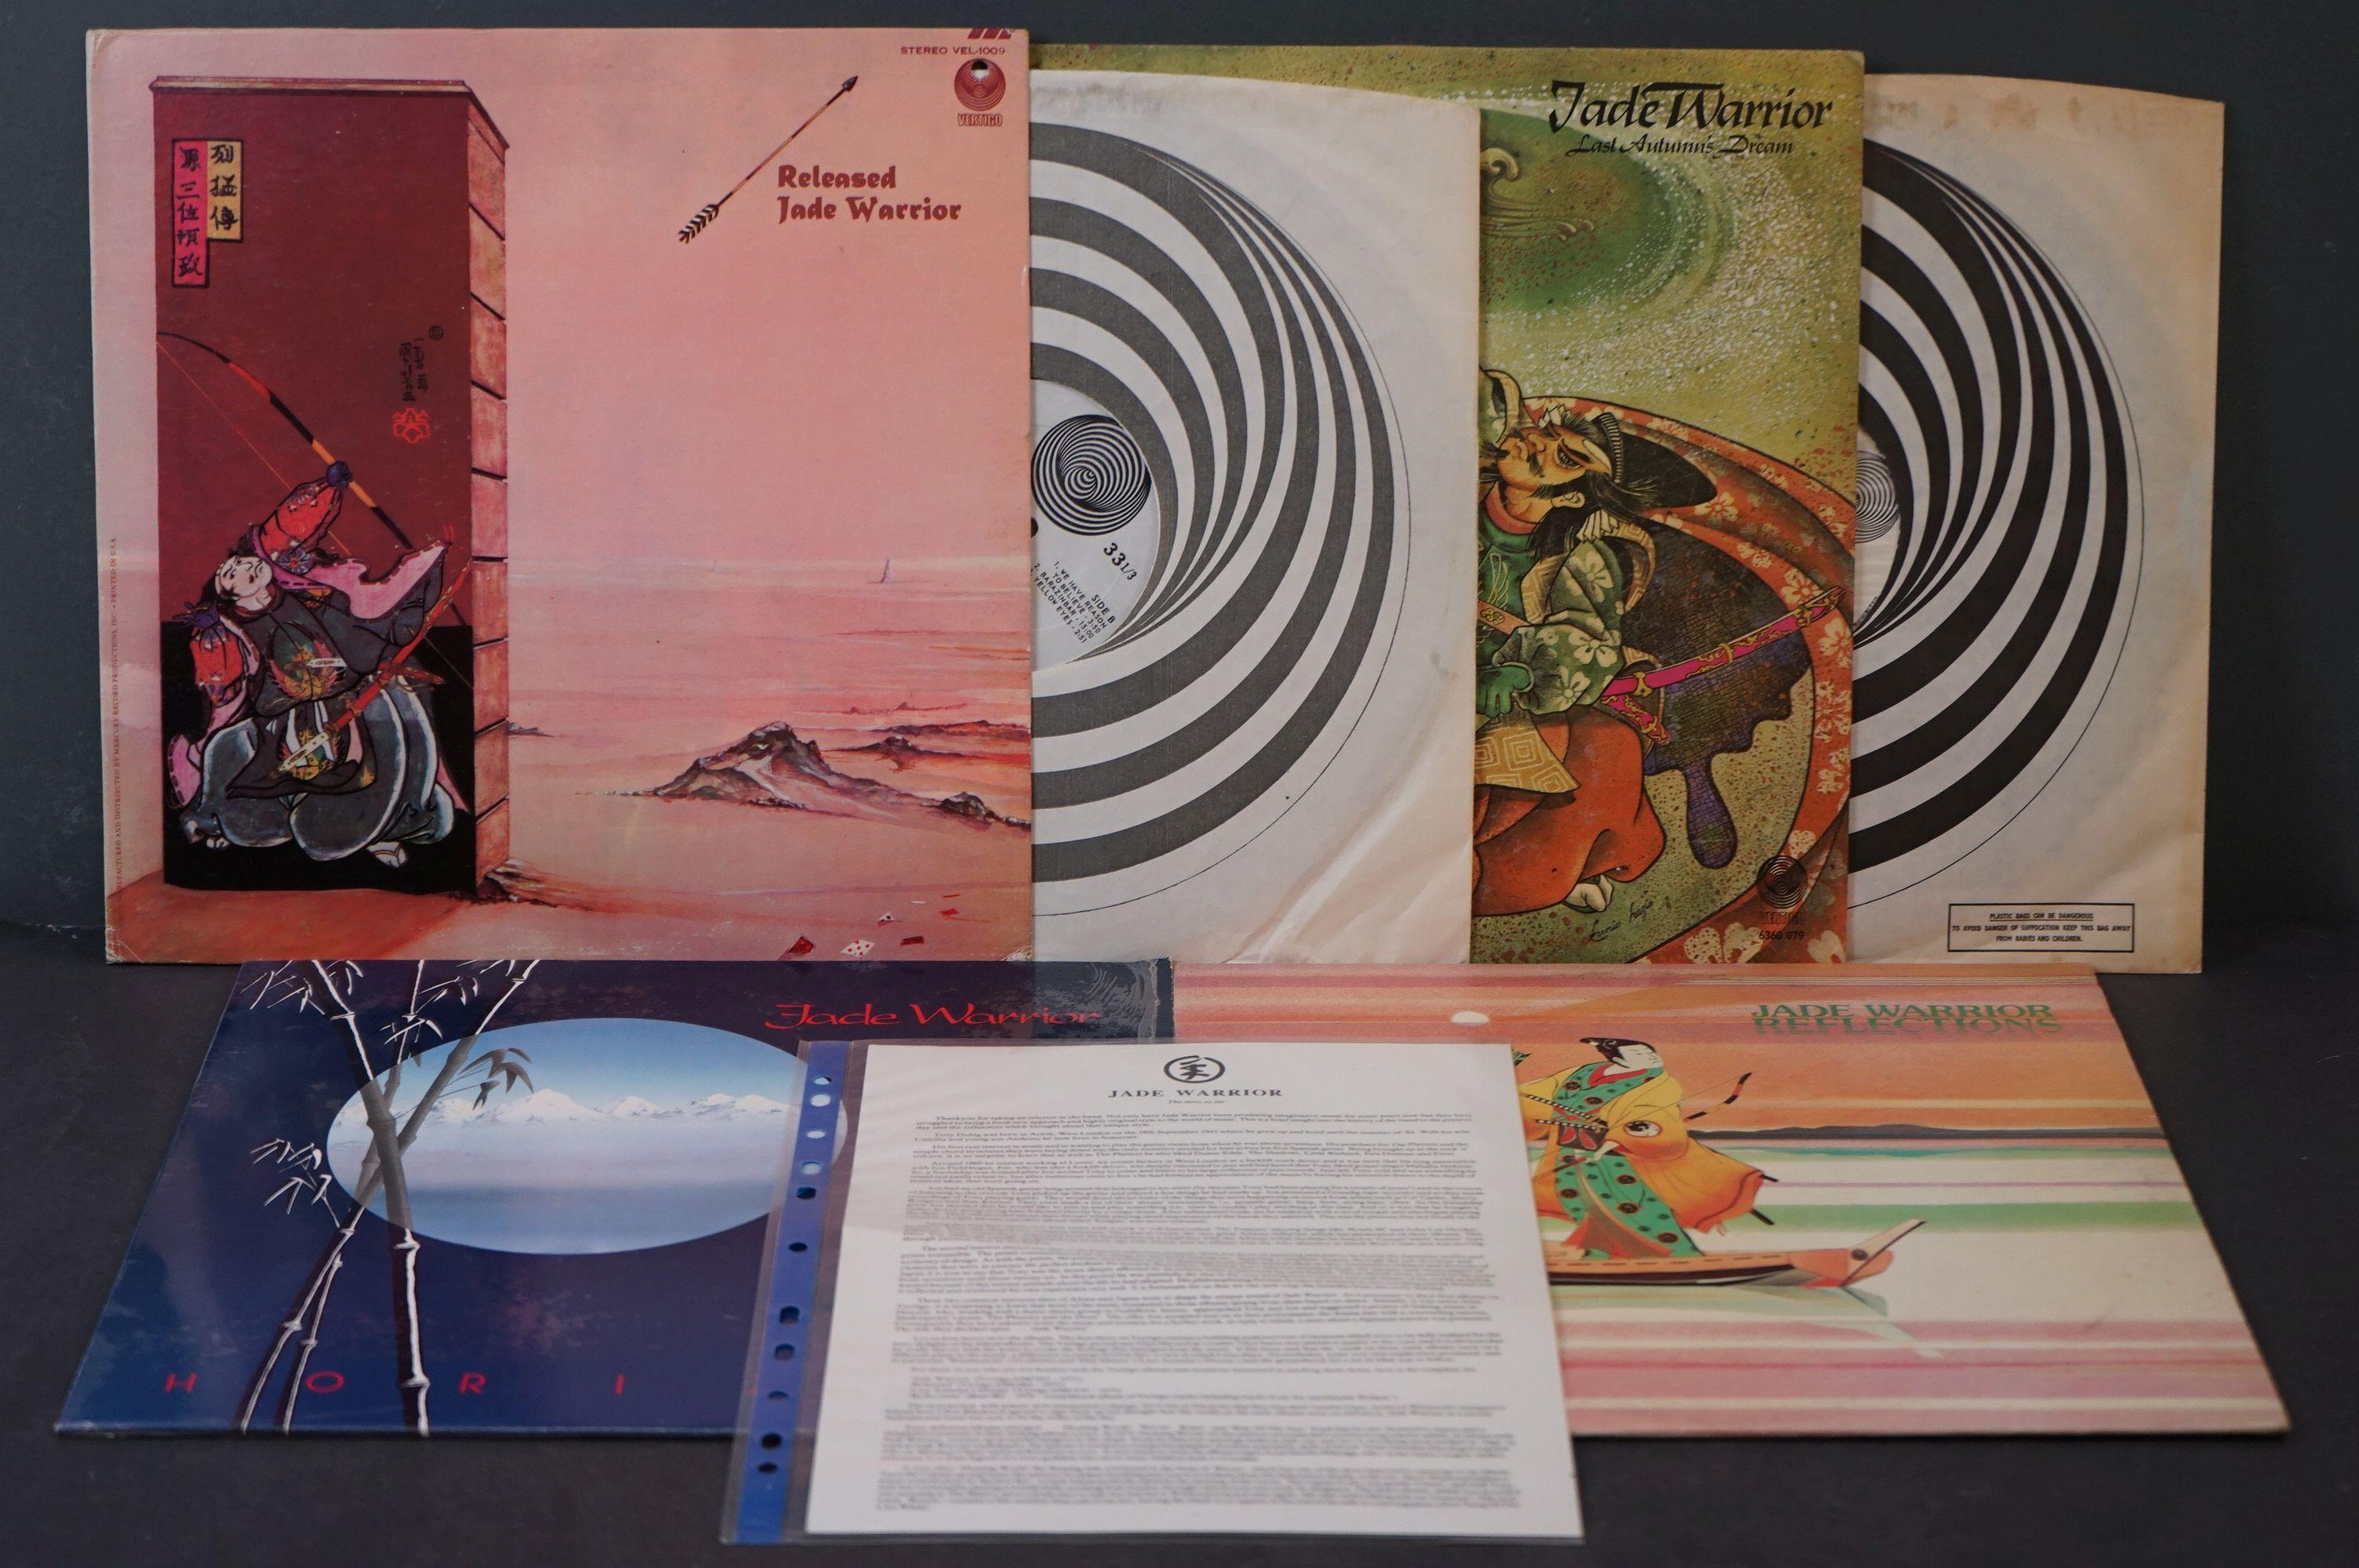 Vinyl - Four Jade Warrior LPs to include Last Autumn Dream LP on Vertigo Deluxe 6360079 gatefold